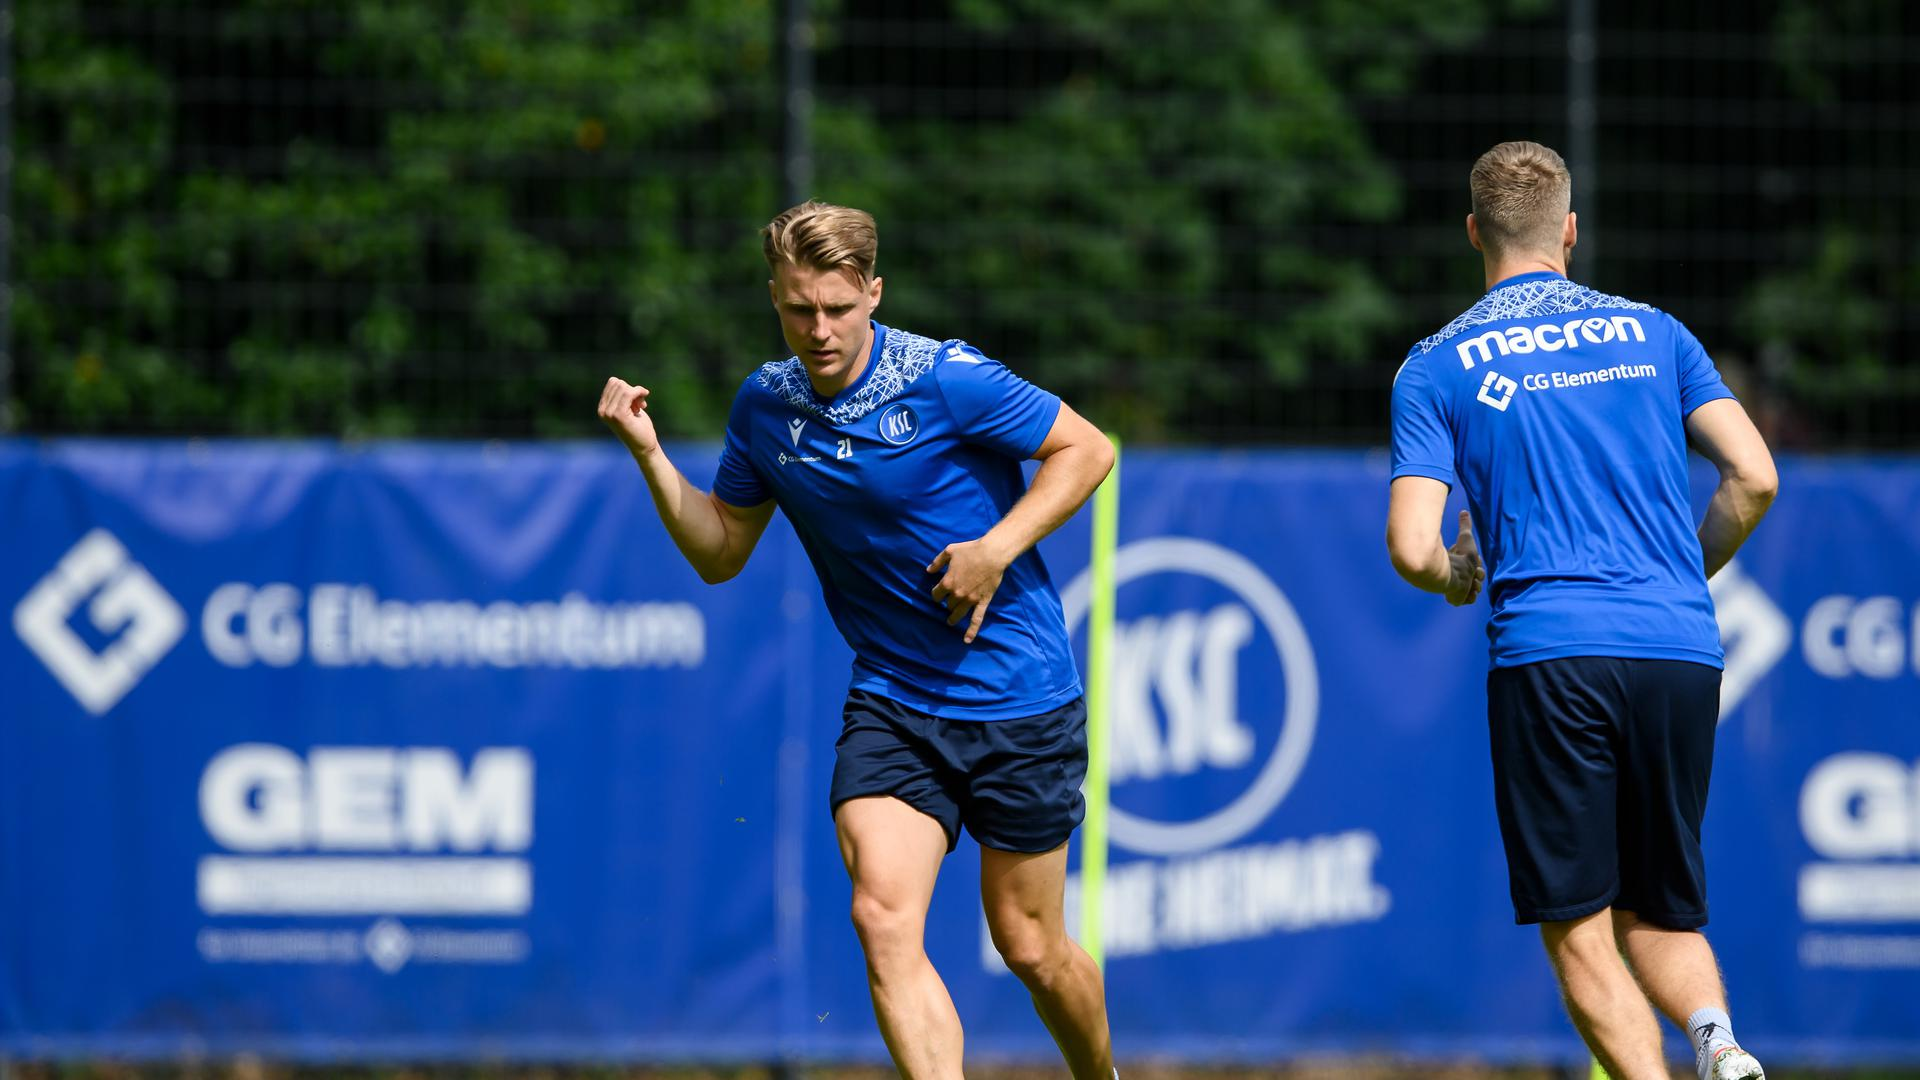 Marco Thiede (KSC) am Ball.  GES/ Fussball/ 2. Bundesliga: Karlsruher SC - Training, 24.06.2021  Football/Soccer: 2. Bundesliga: KSC Training, Karlsruhe, June 24, 2021